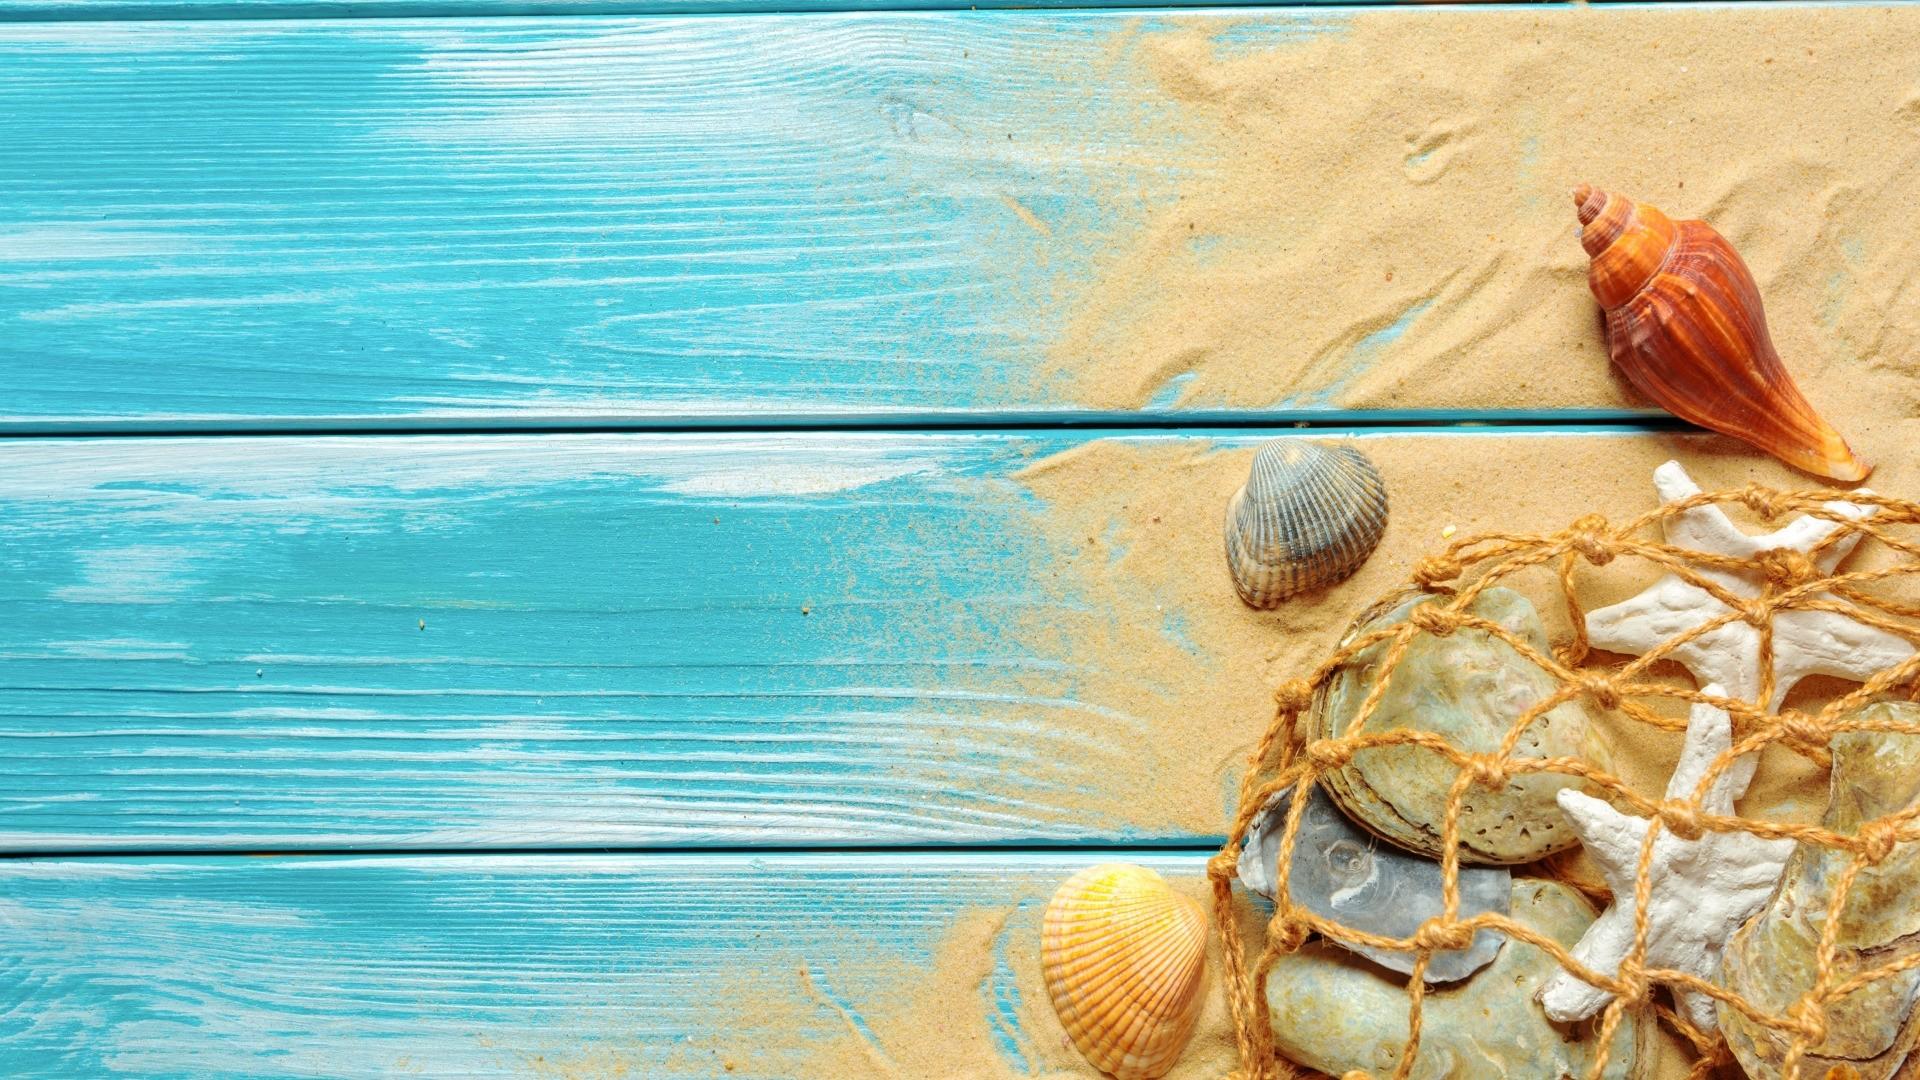 Seashells On Boards Wallpaper theme